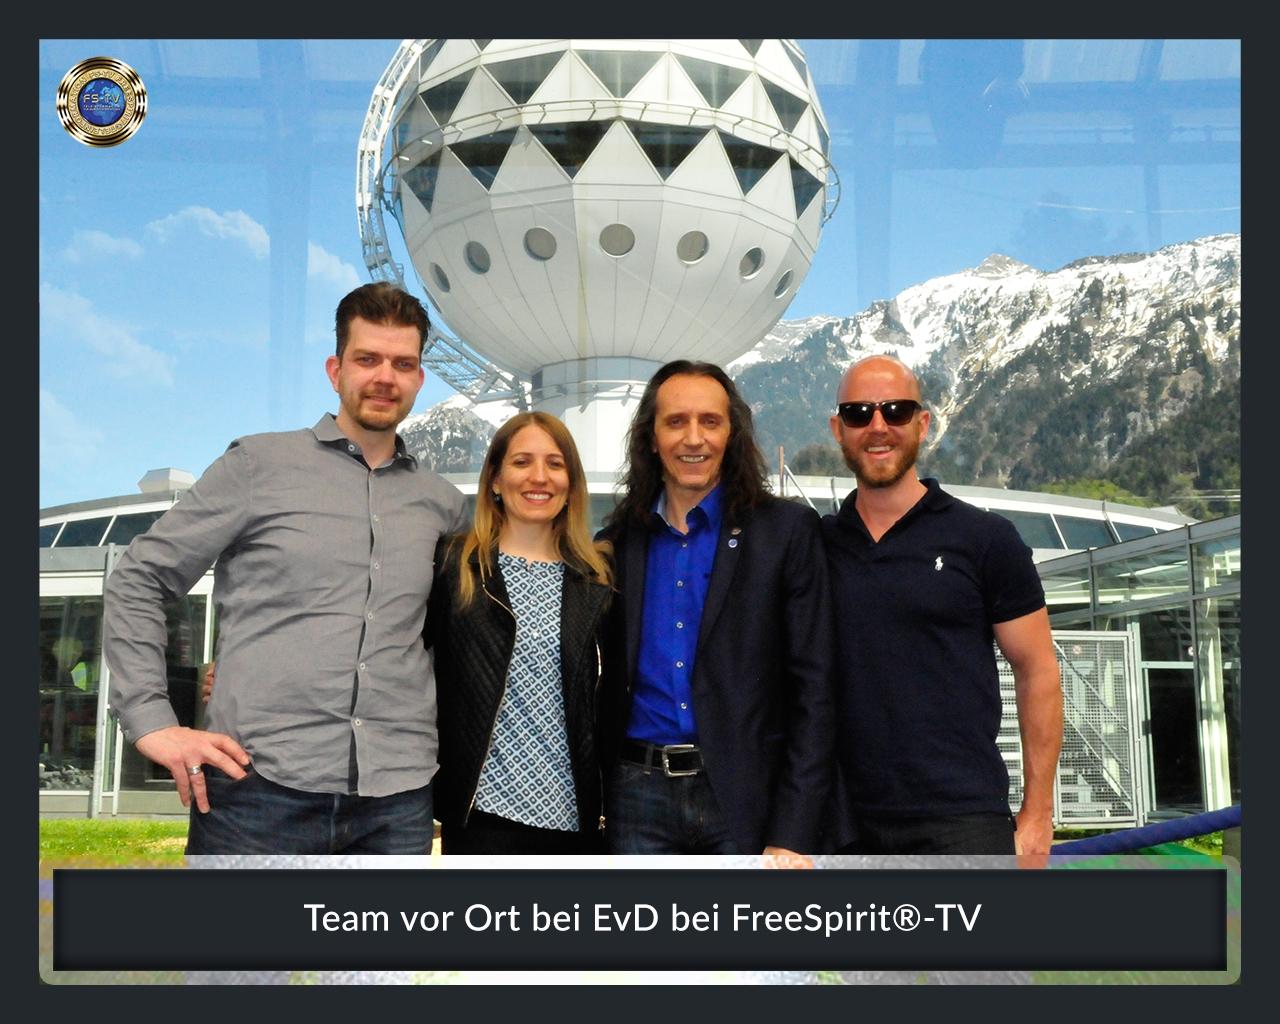 FS-TV-Bildergallerie-Team vor Ort